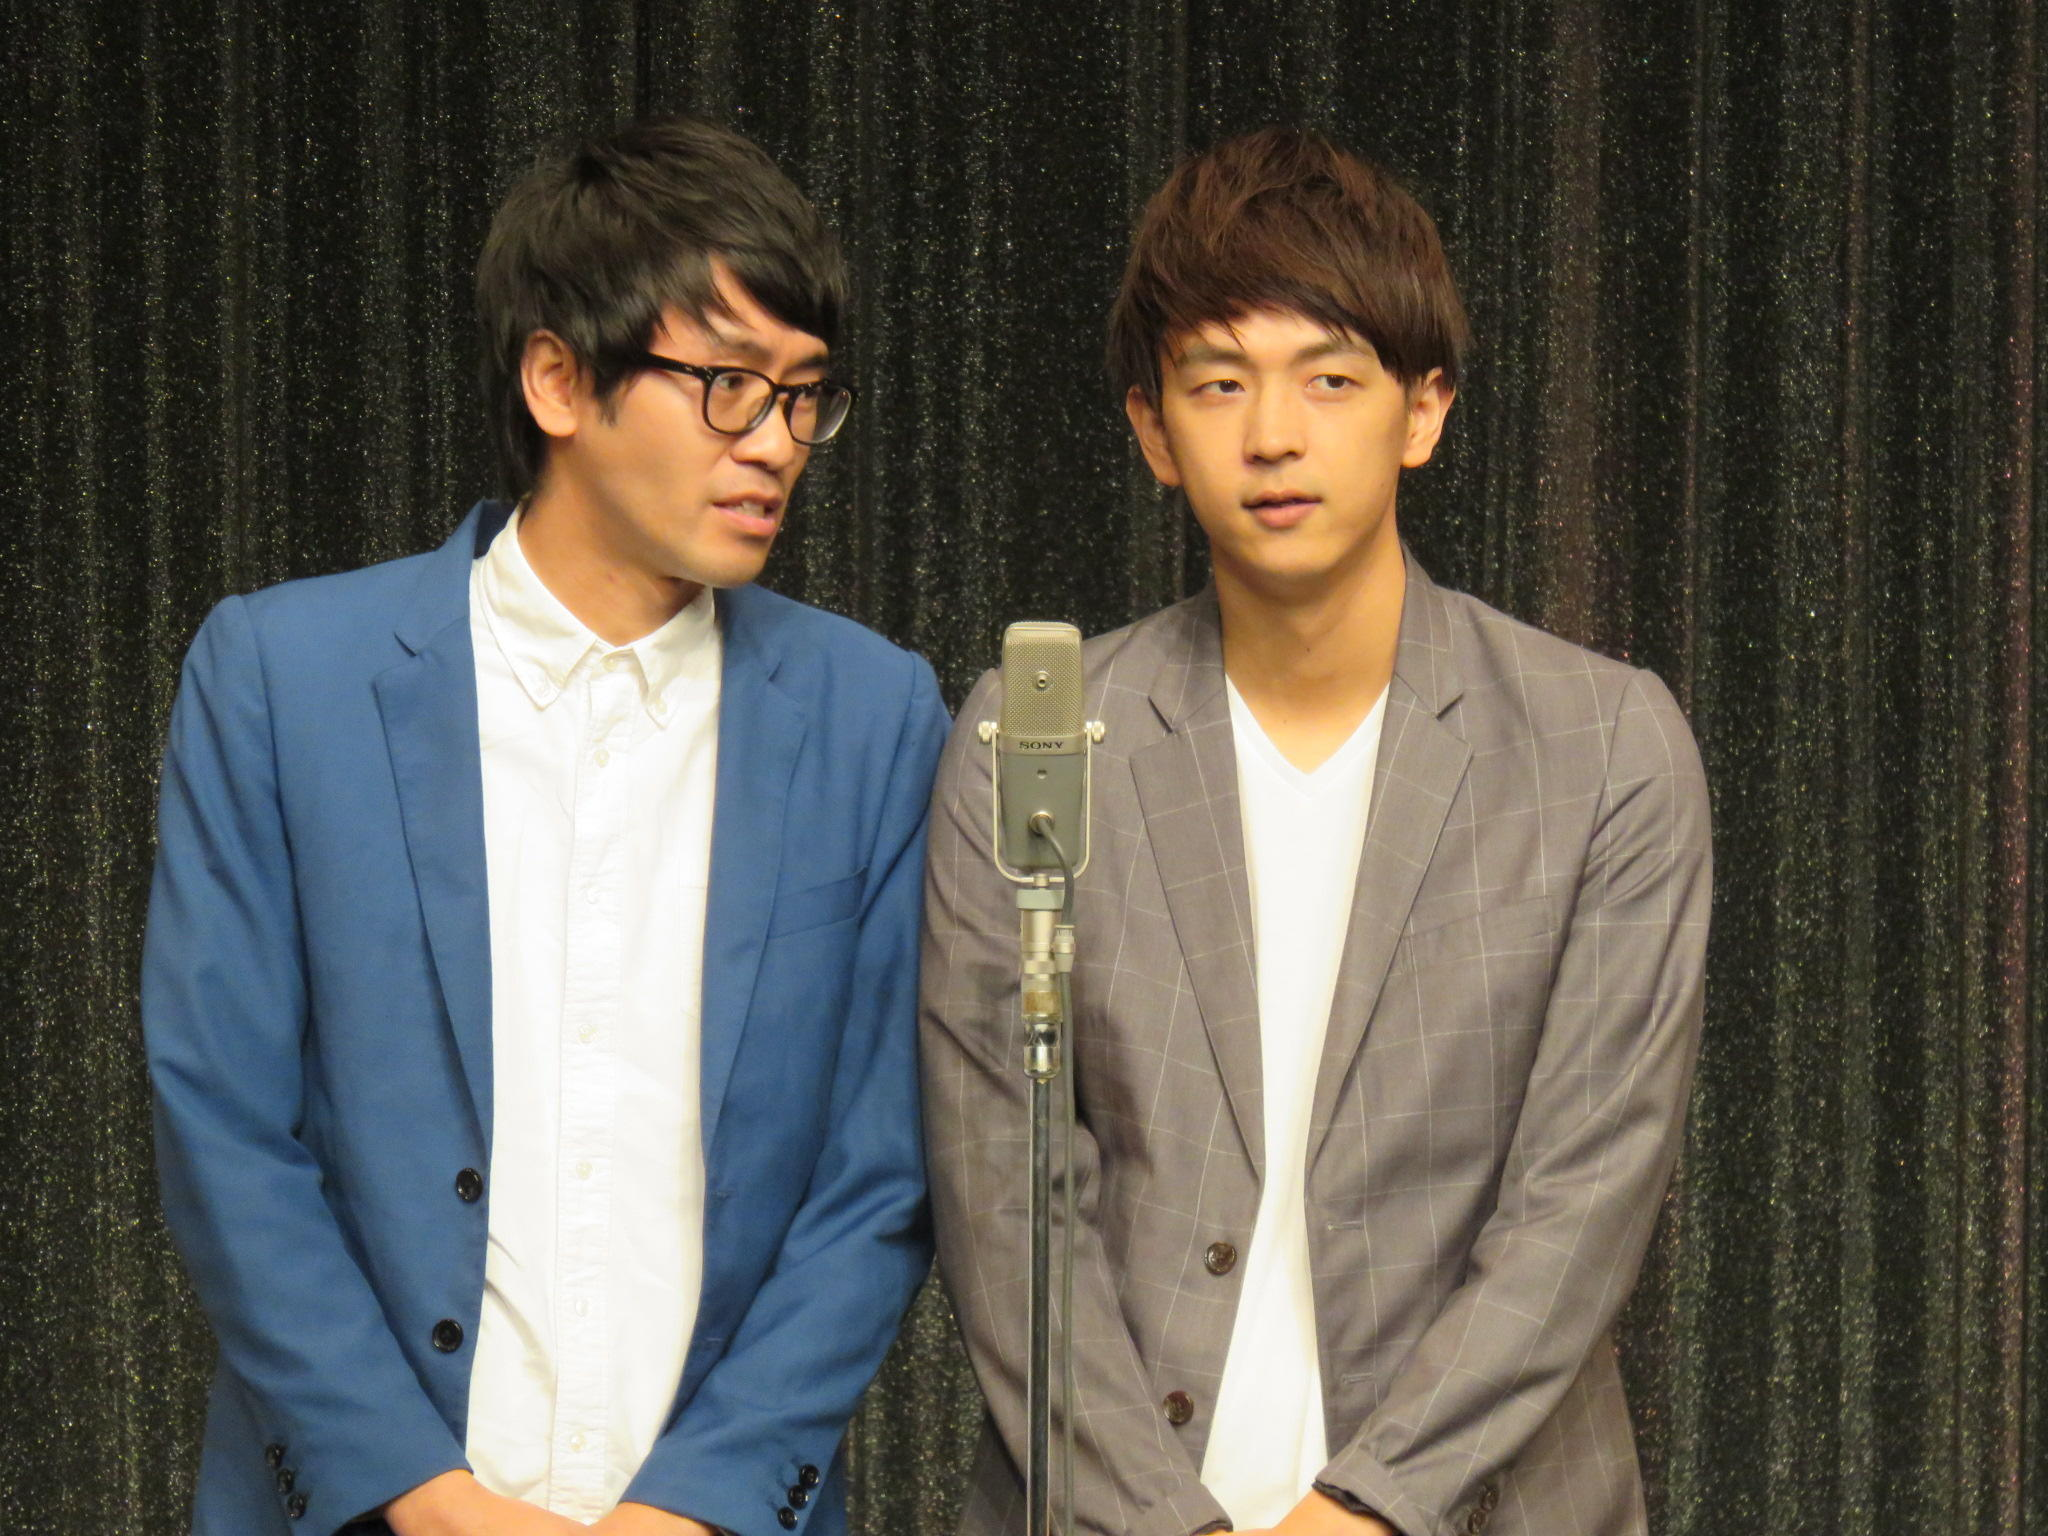 http://news.yoshimoto.co.jp/20151230165336-c65e7a2ed7d755a73fcb66bbcd80f252249101f2.jpg